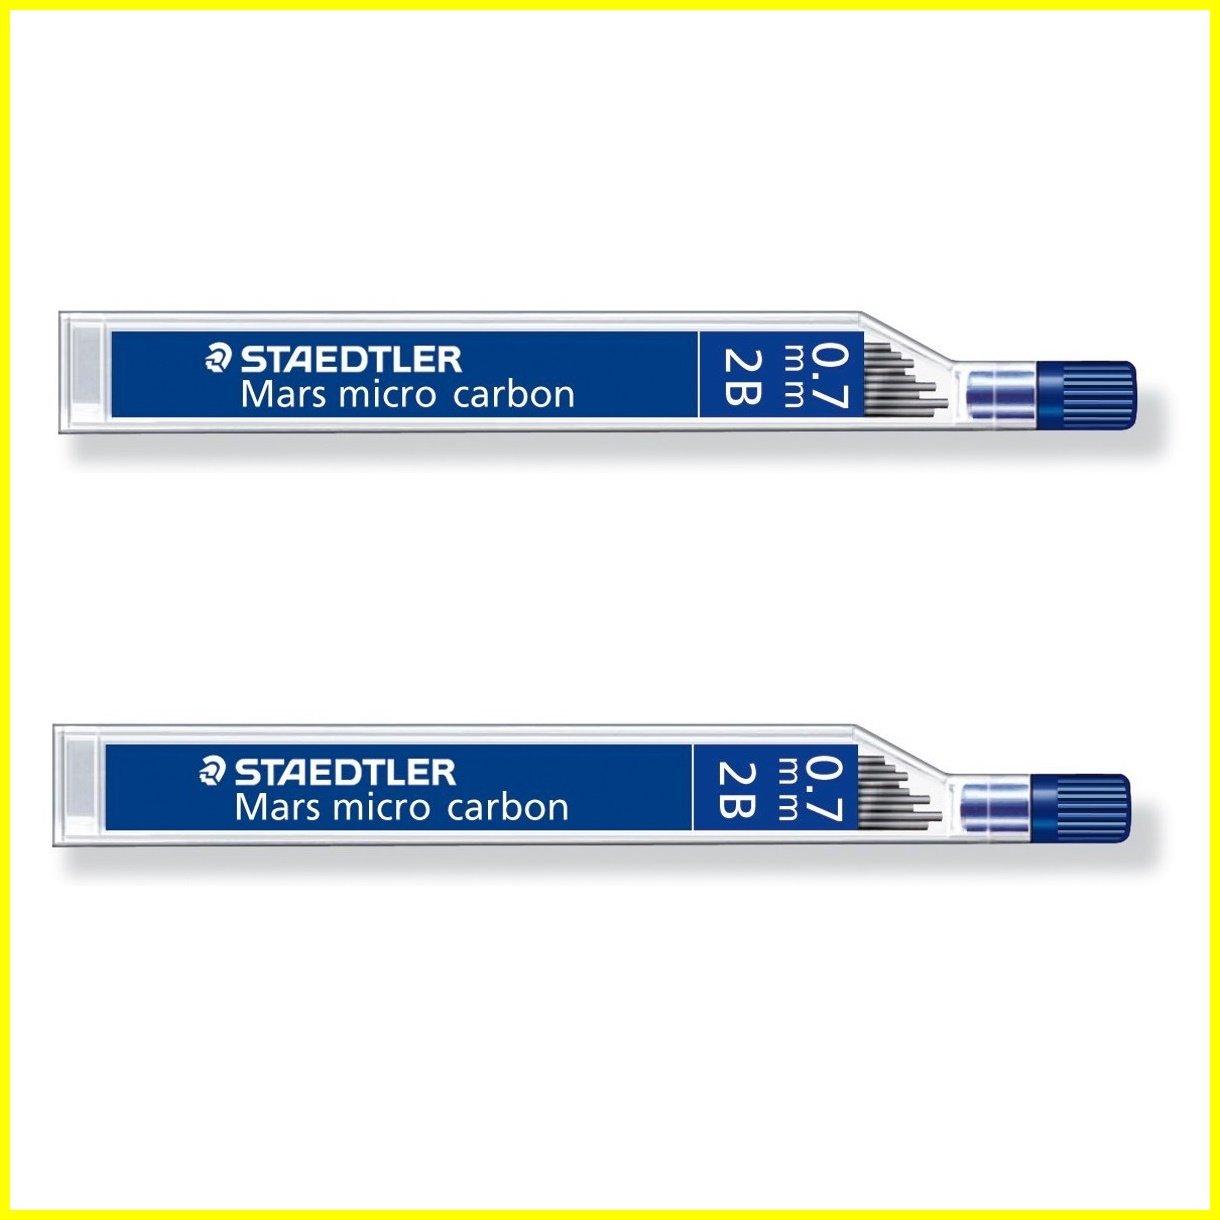 STAEDTLER Mars micro carbon 250 0.7mm 2B - Pencil lead refills - 2 Tubes / Packs (24 Leads) HB